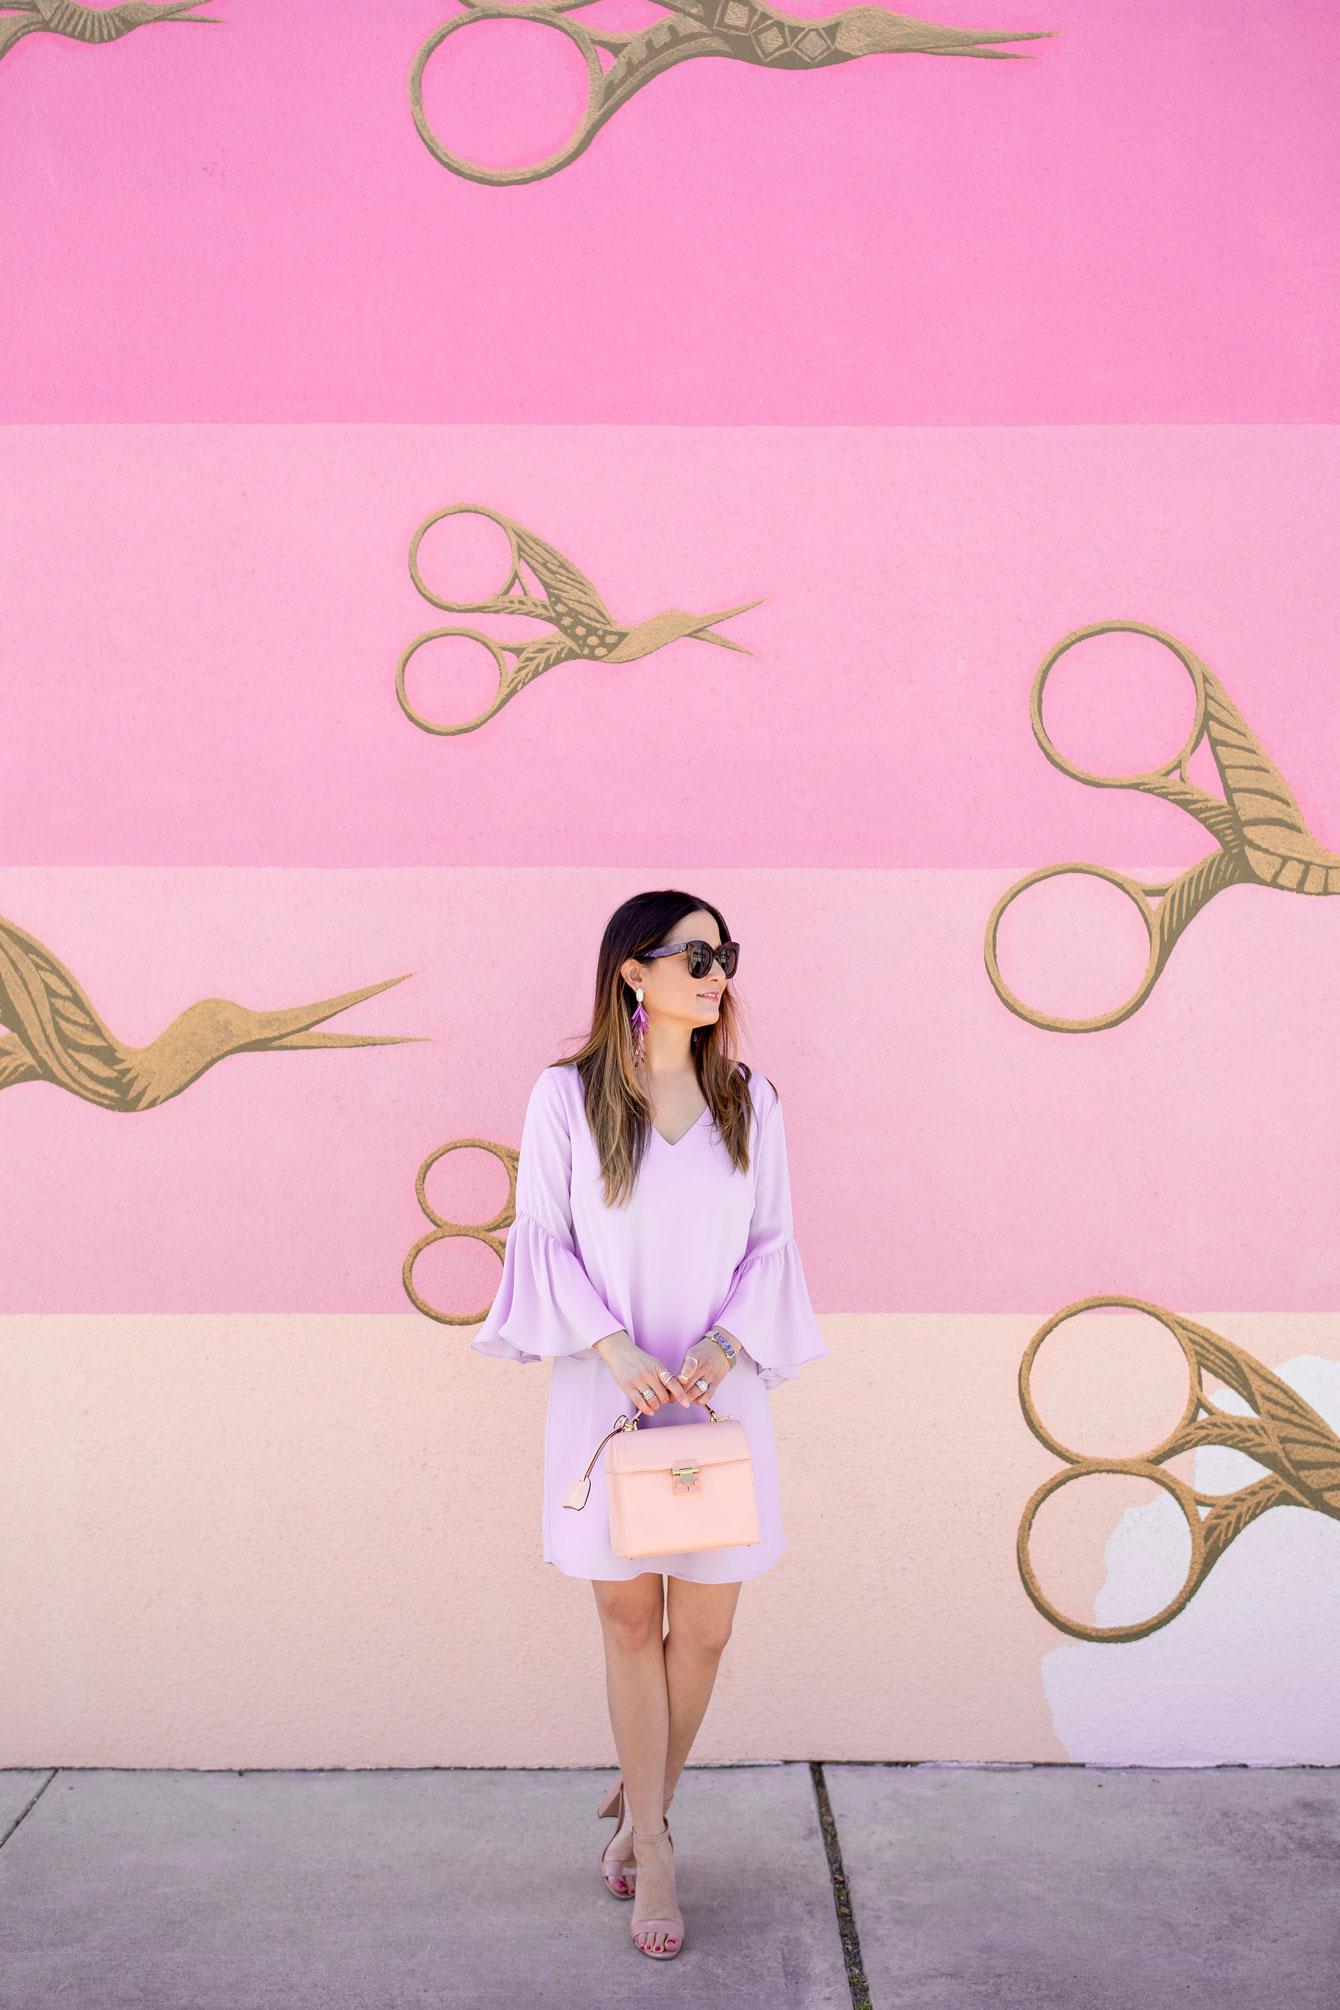 Austin Pink Scissors Mural